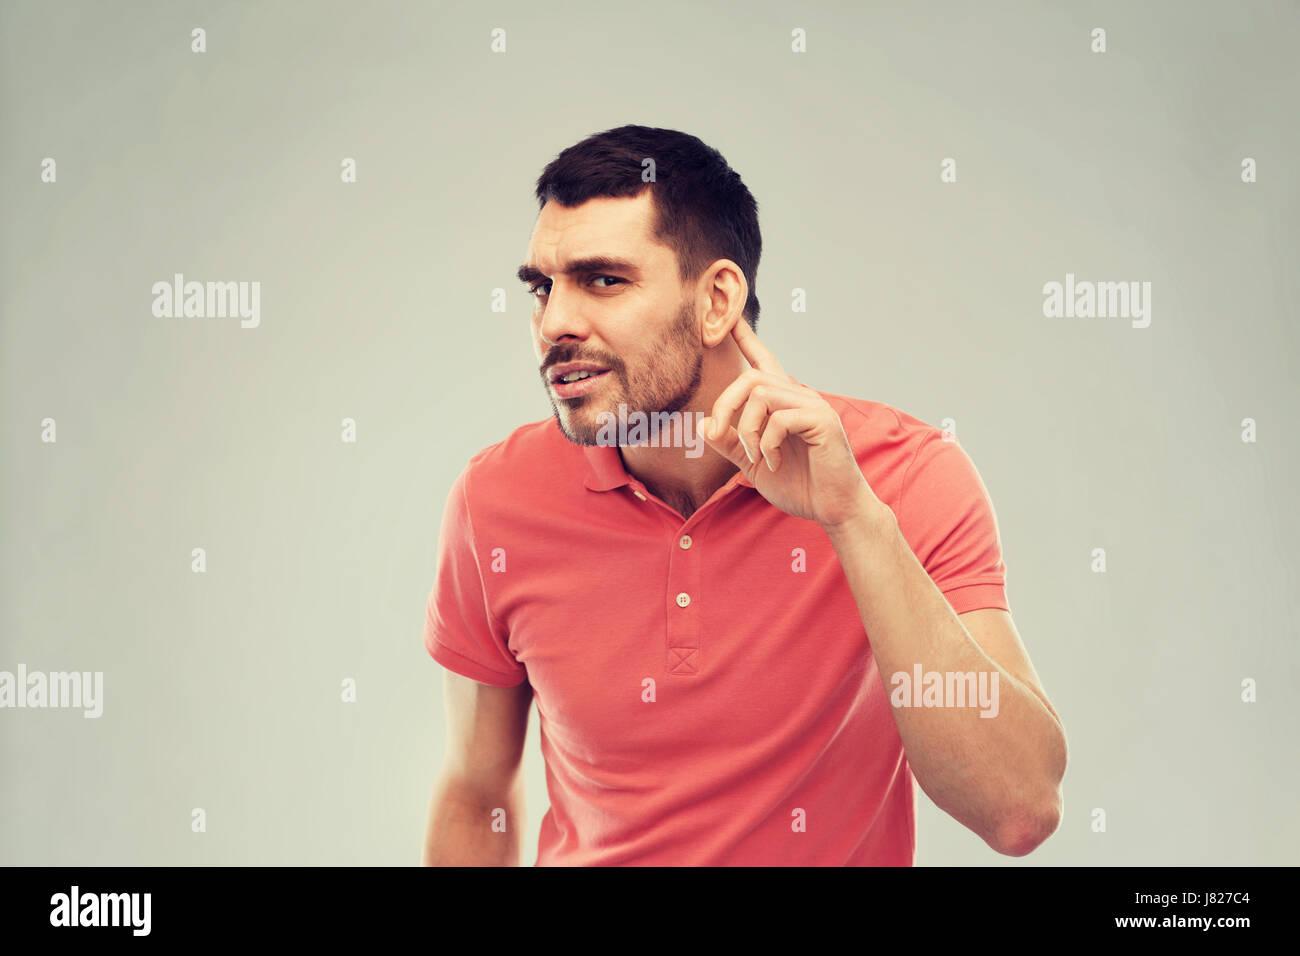 man having hearing problem listening to something - Stock Image